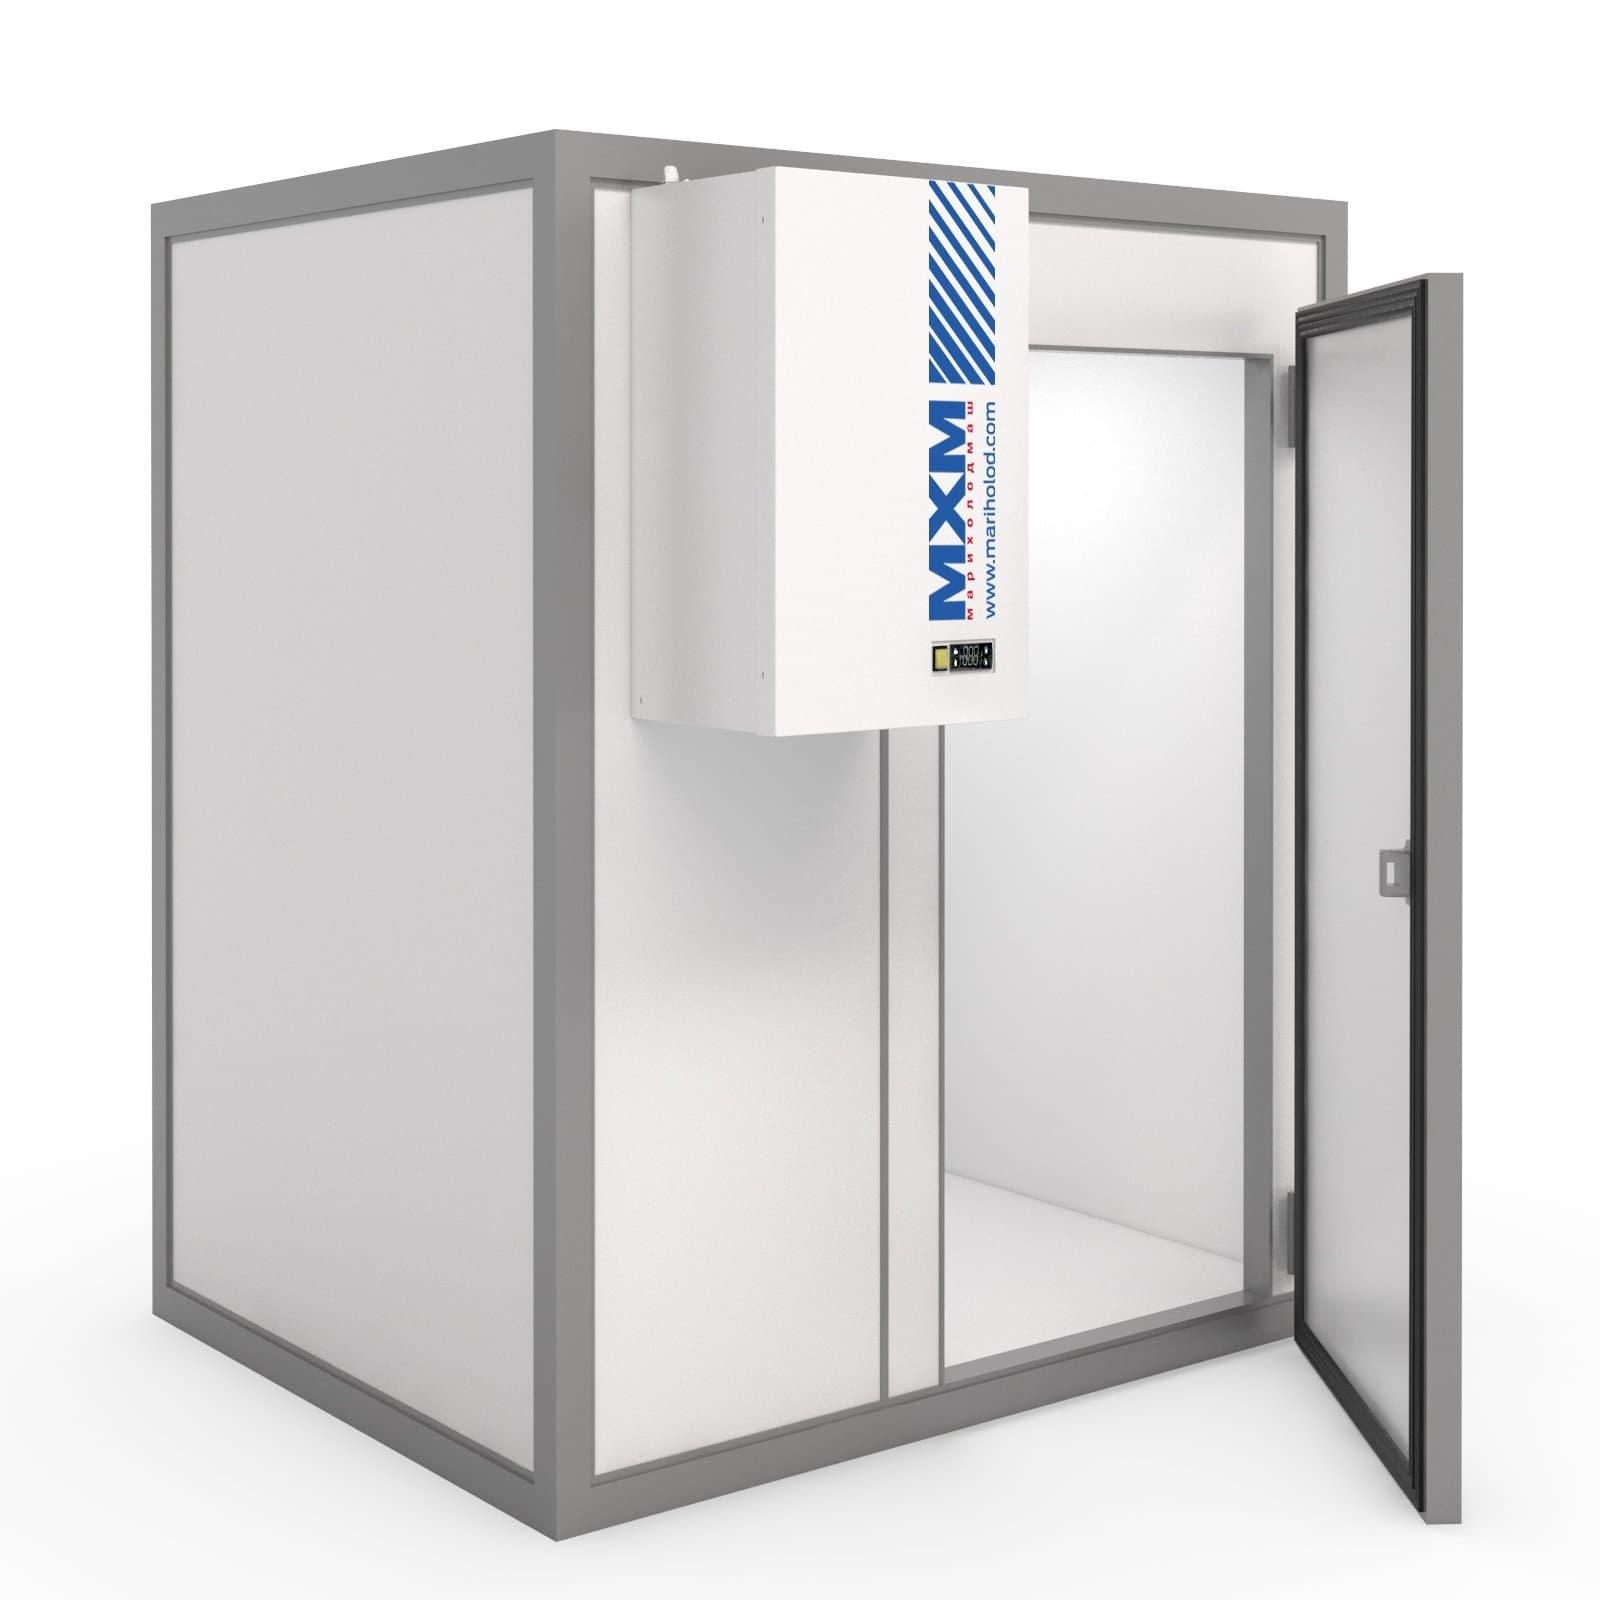 Камера холодильная МХМ КХН-37,26 1660×10960×2460